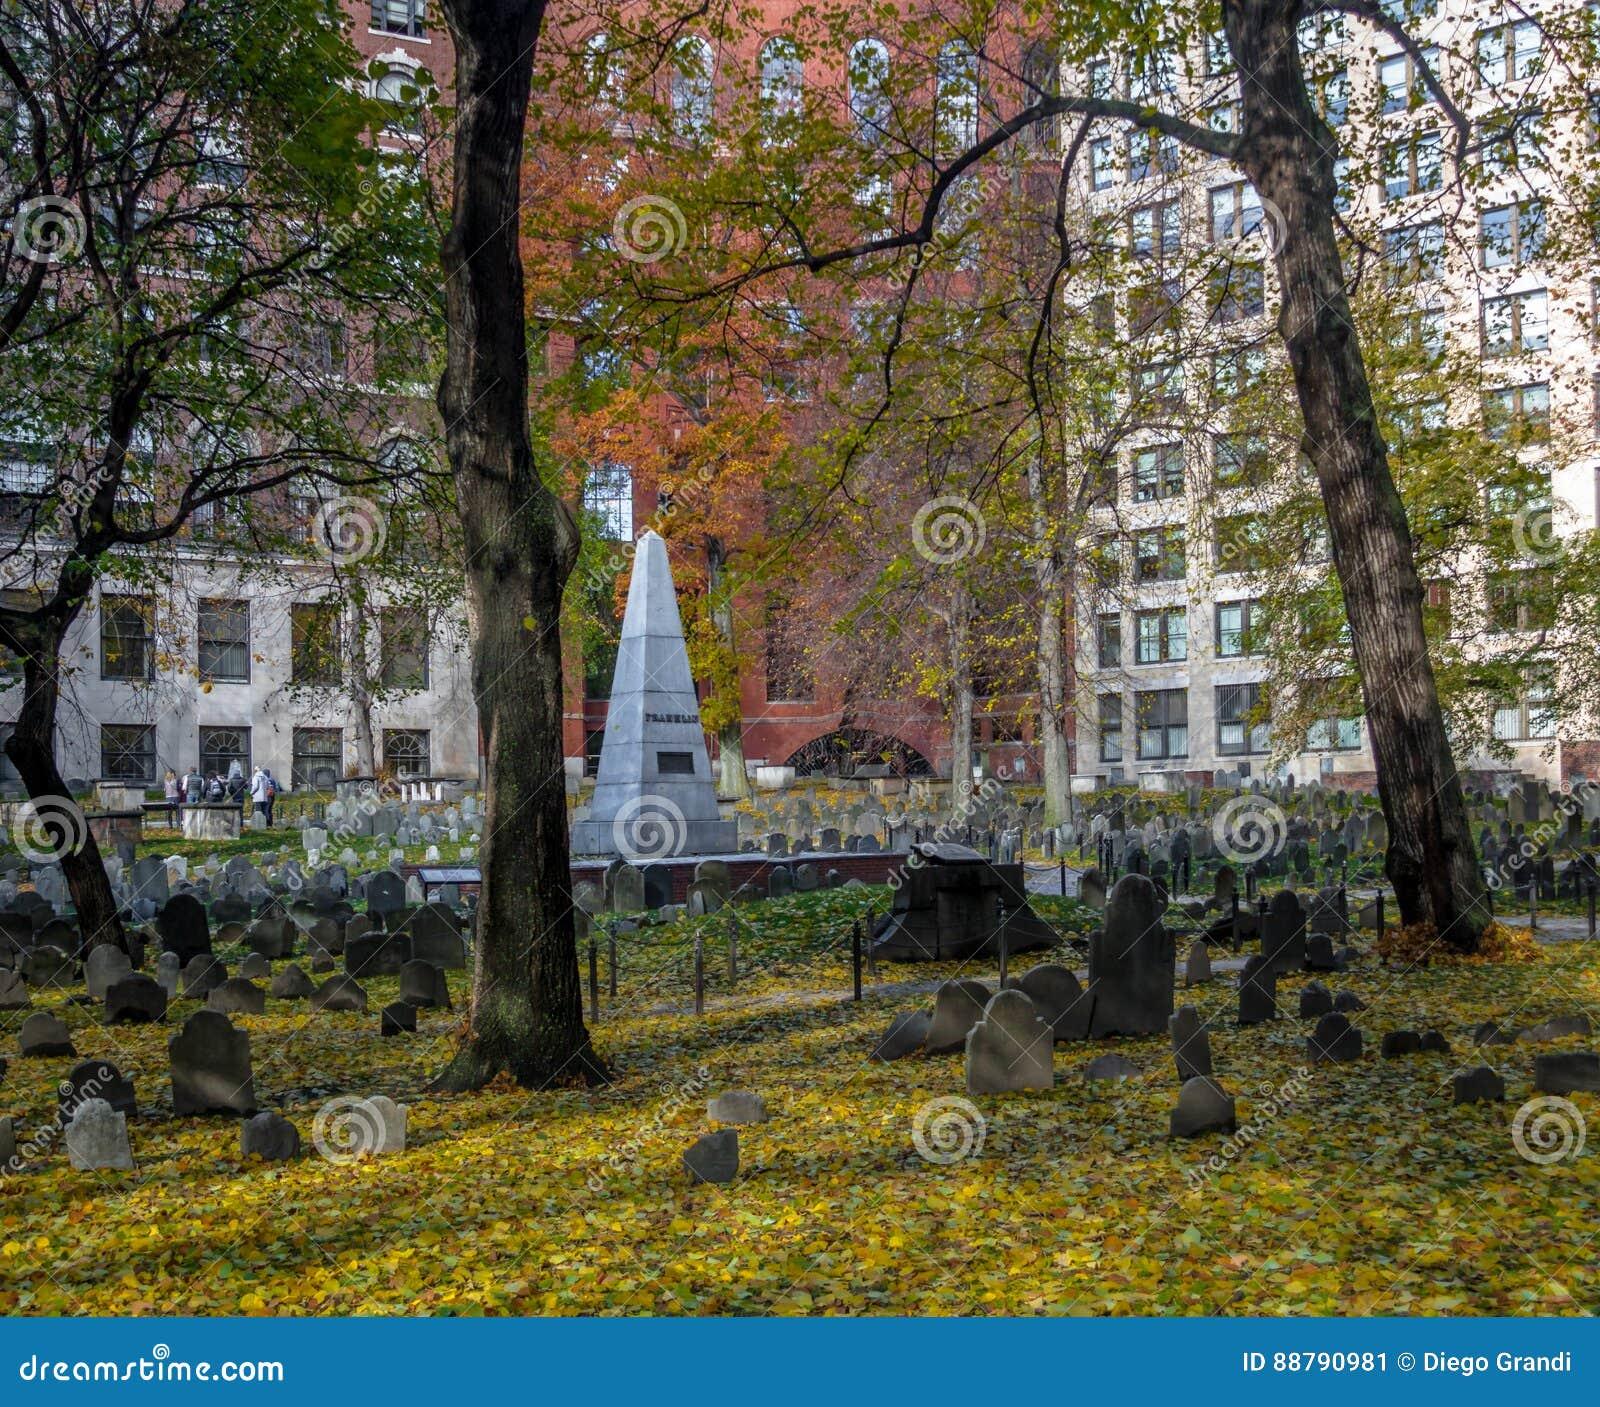 Cementerio de la tierra de entierro del granero - Boston, Massachusetts, los E.E.U.U.